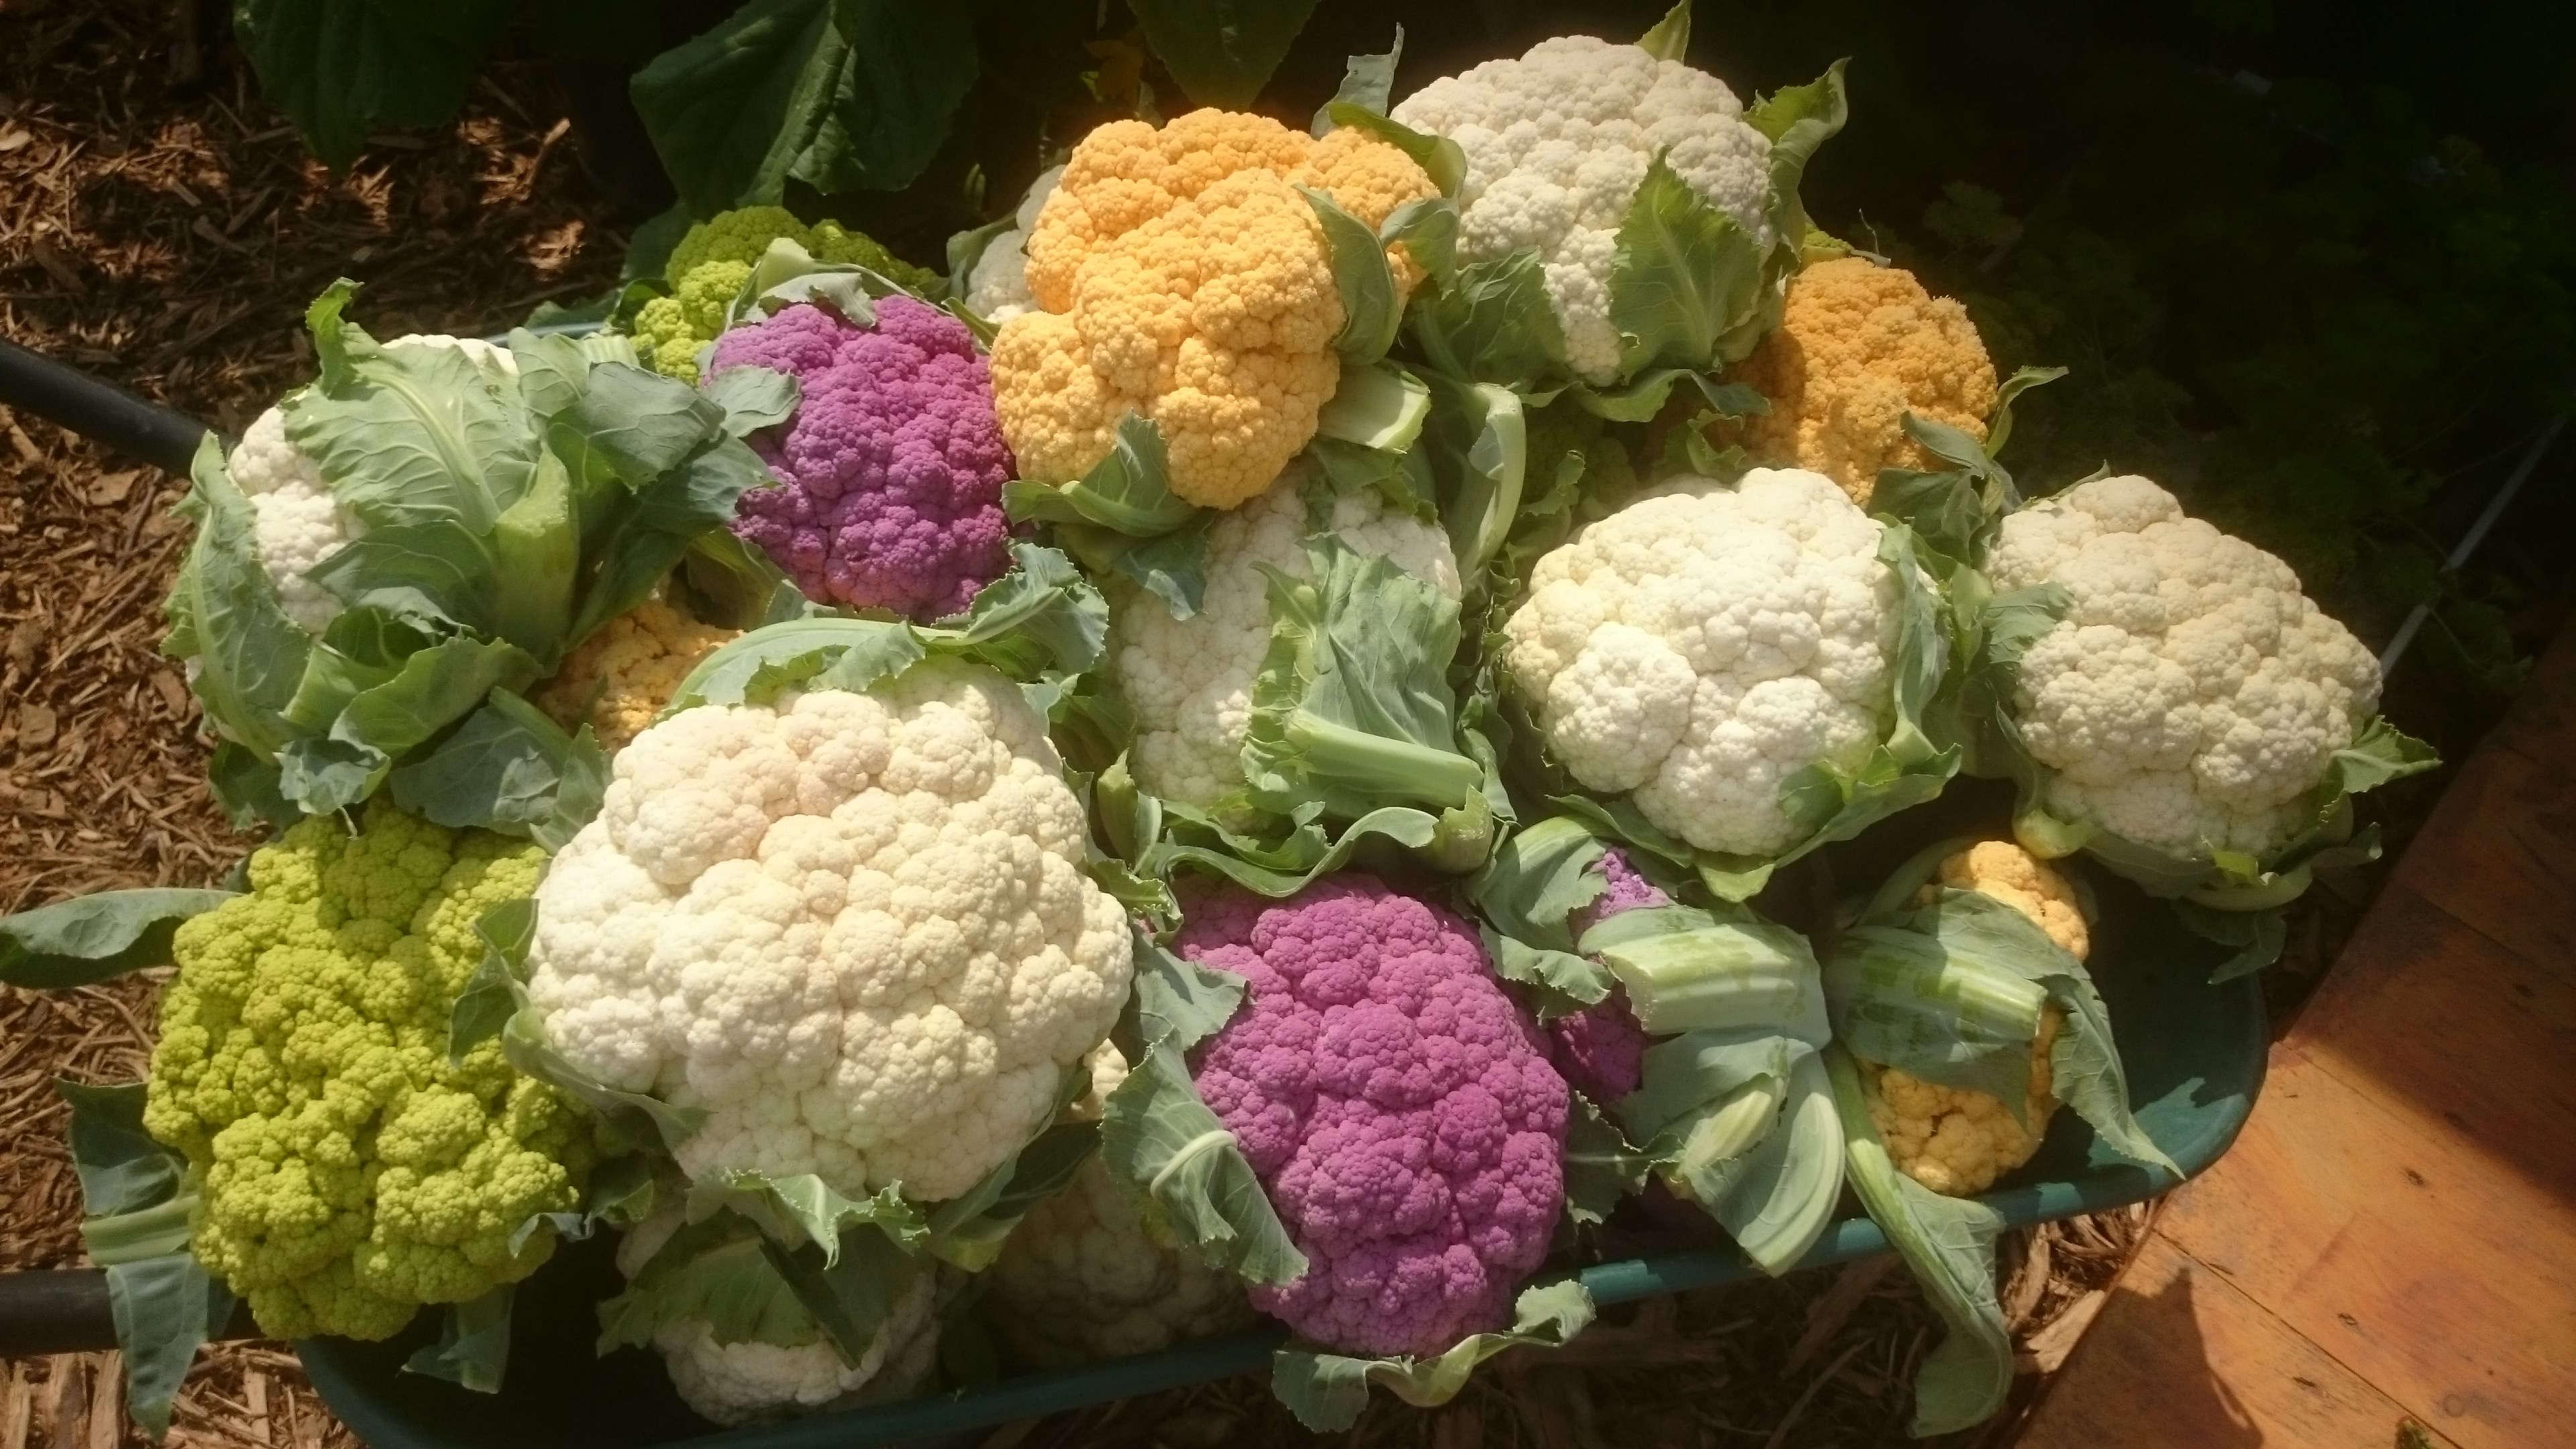 cauliflowers-white-purple-yellow-dirk-ingo-franke-wikimedia